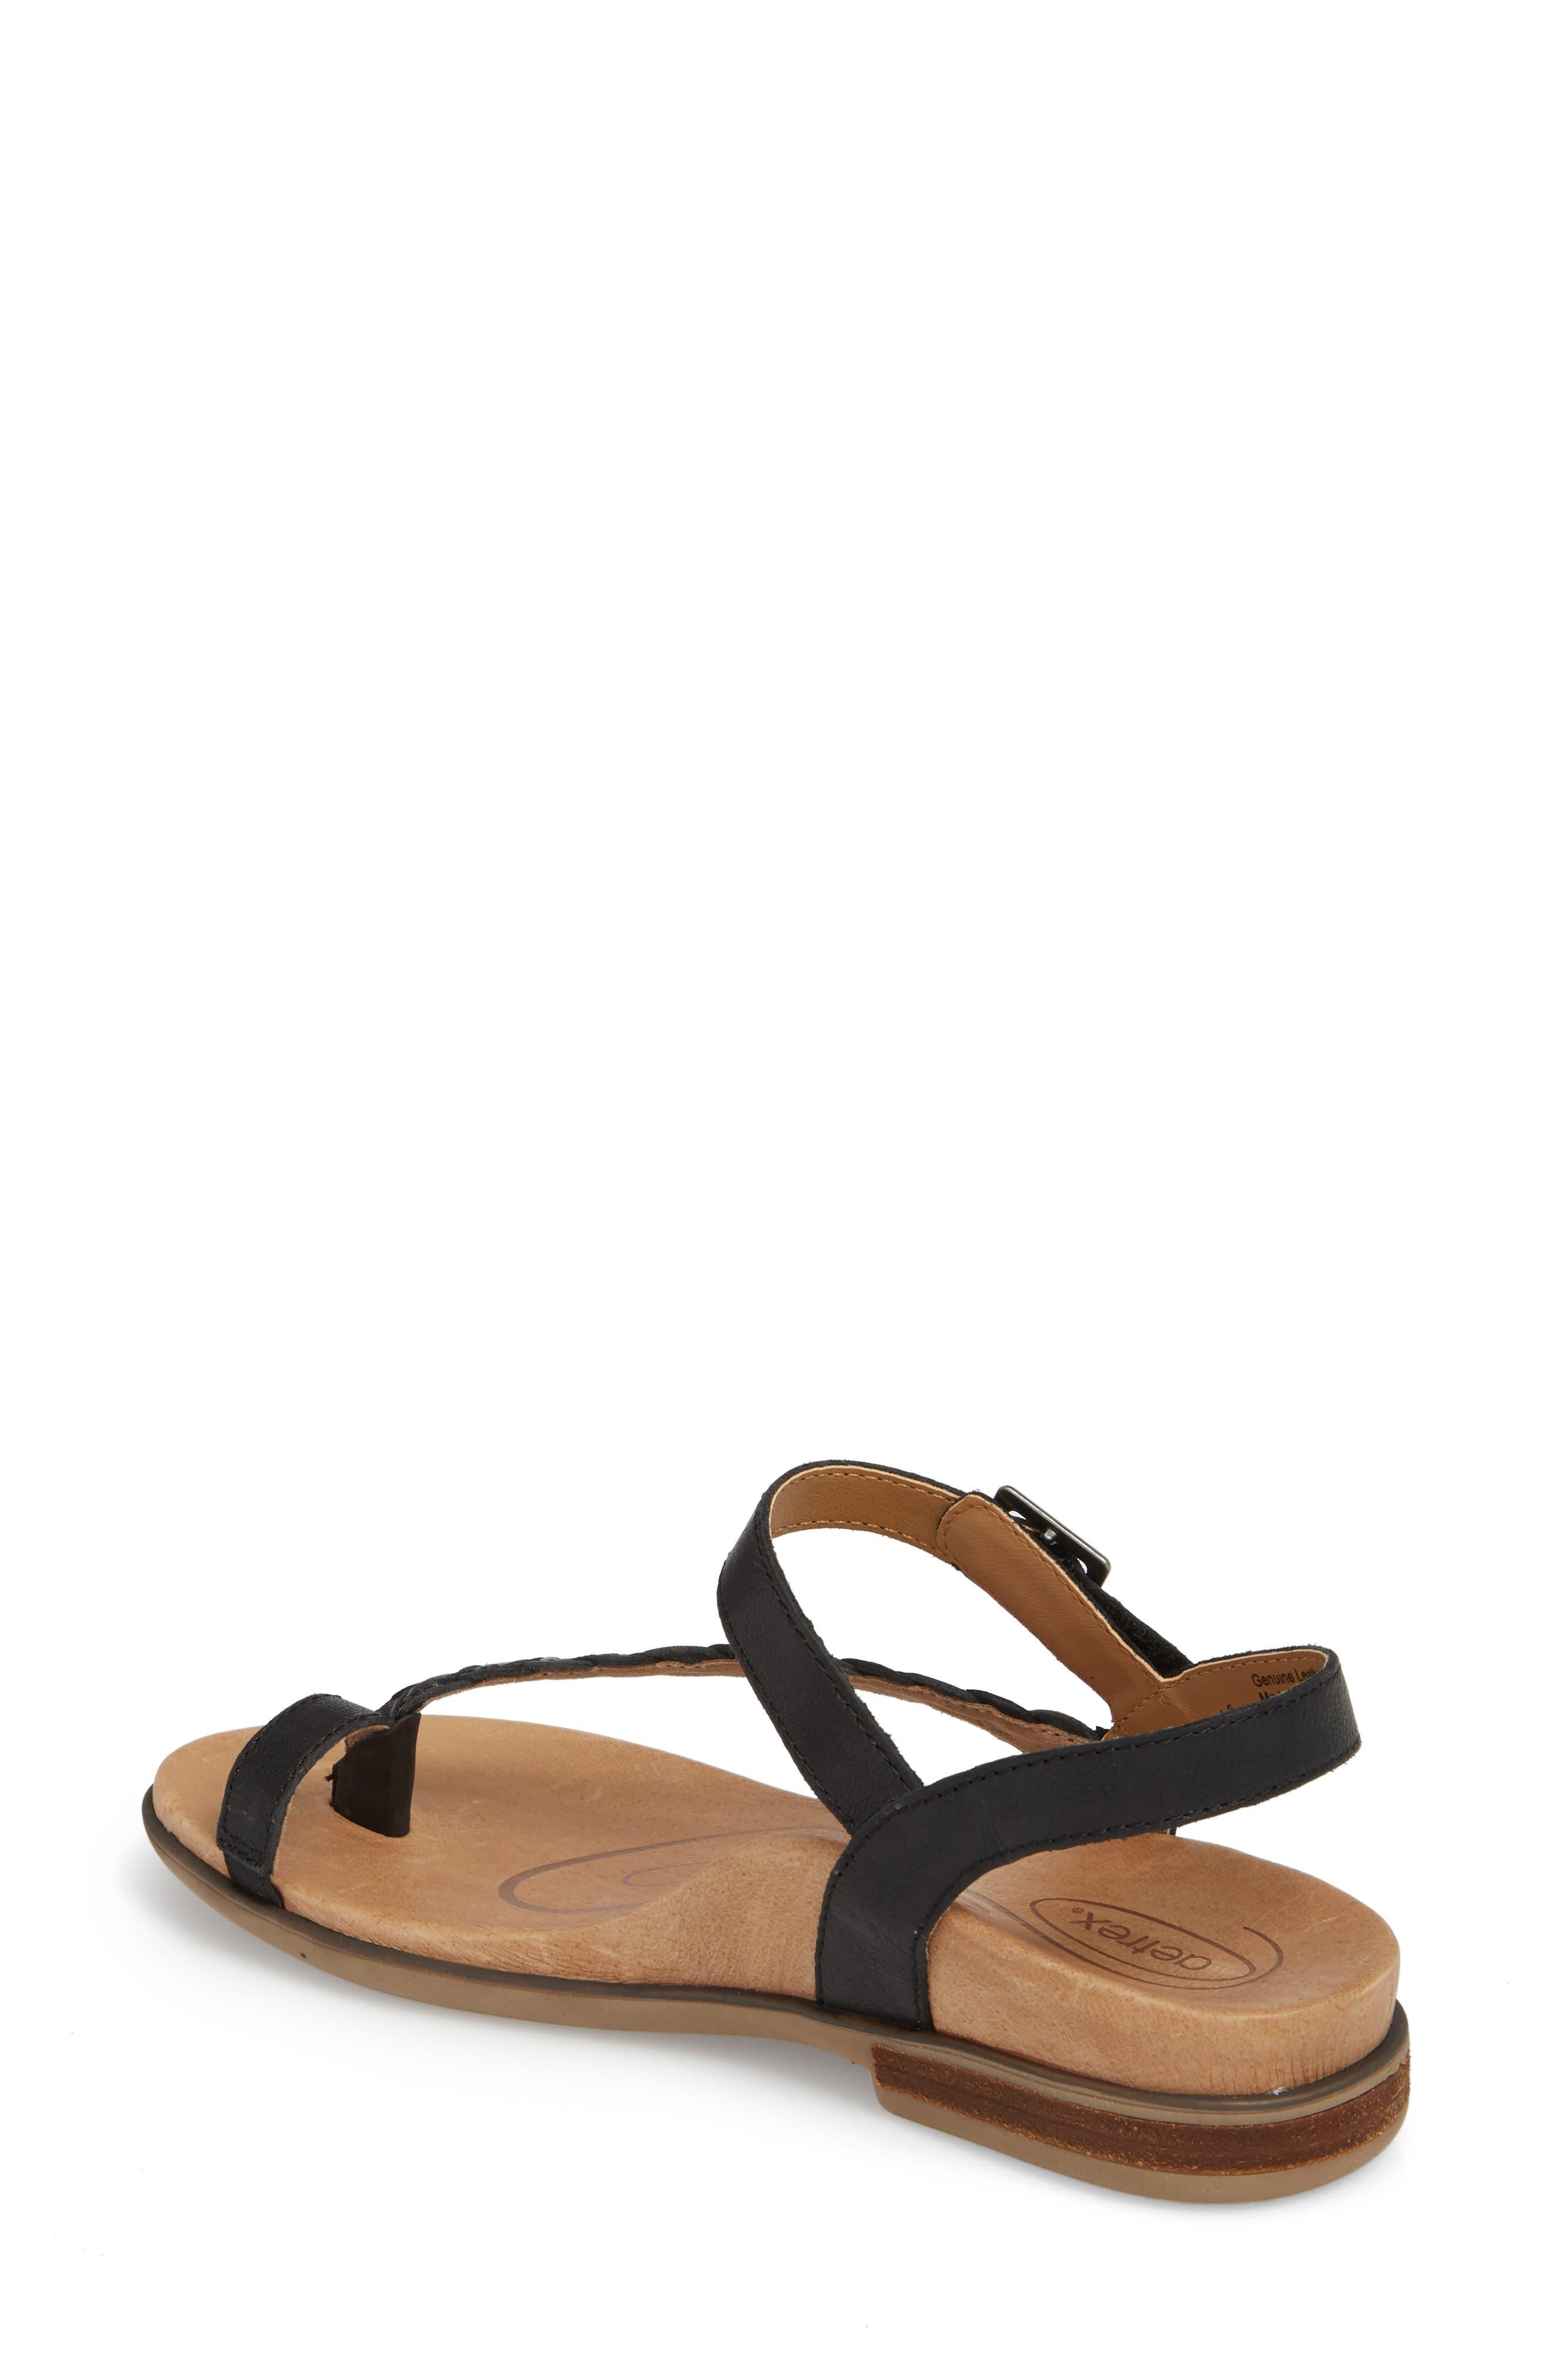 AETREX, Evie Braided Strap Sandal, Alternate thumbnail 2, color, BLACK LEATHER